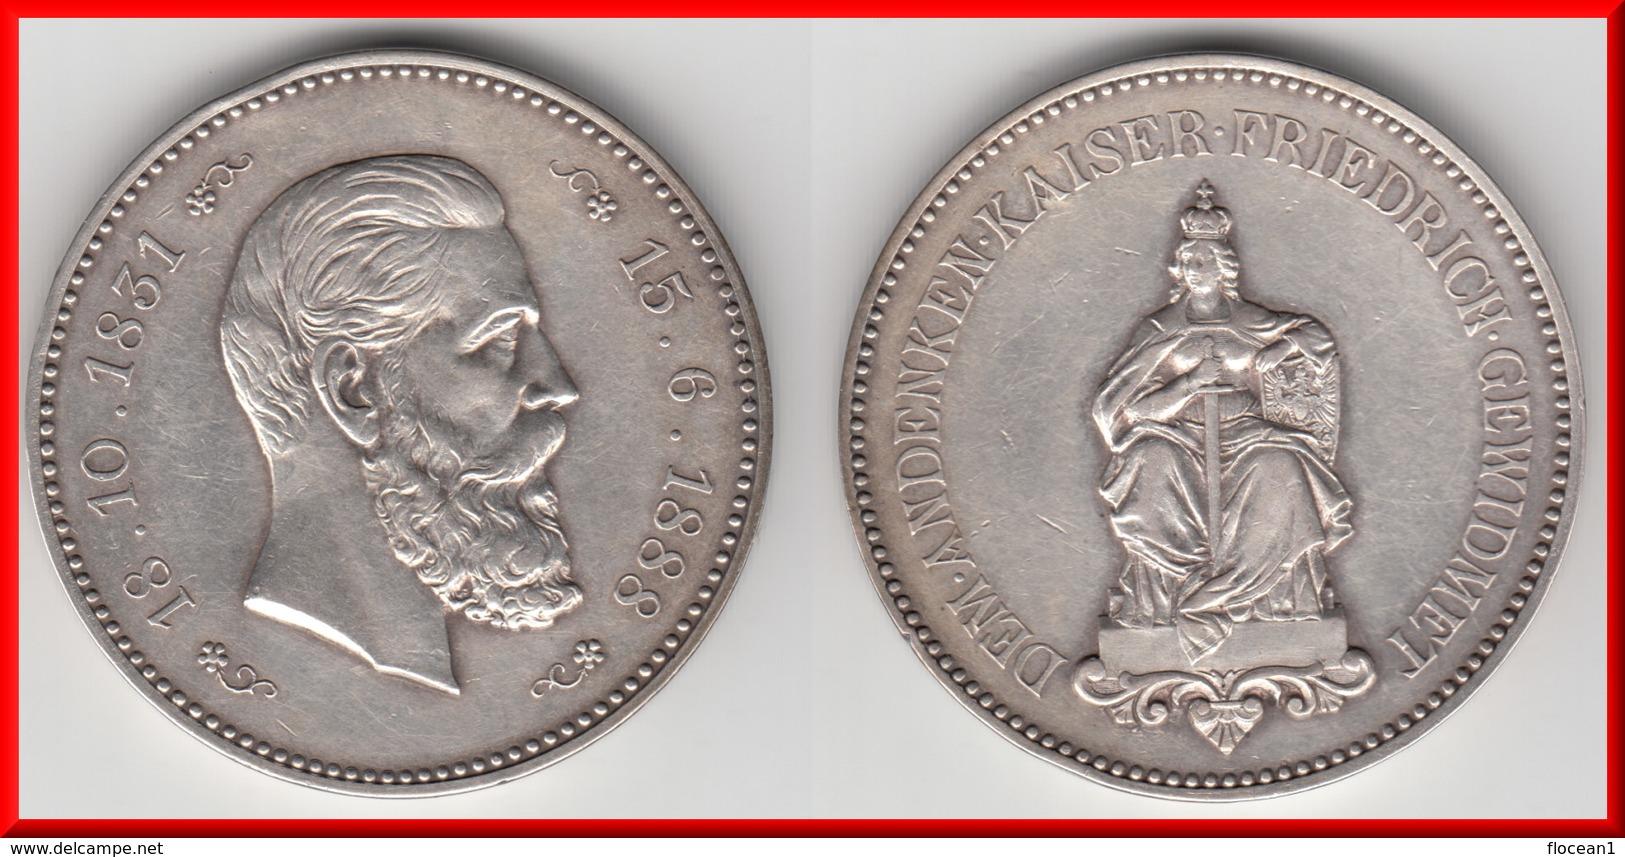 **** PREUSSEN - PRUSSIA - ALLEMAGNE - GERMANY - MEDAL KAISER FRIEDRICH 18.10.1831-13.6.1888 - SILVER **** ACHAT IMMEDIAT - Royaux/De Noblesse